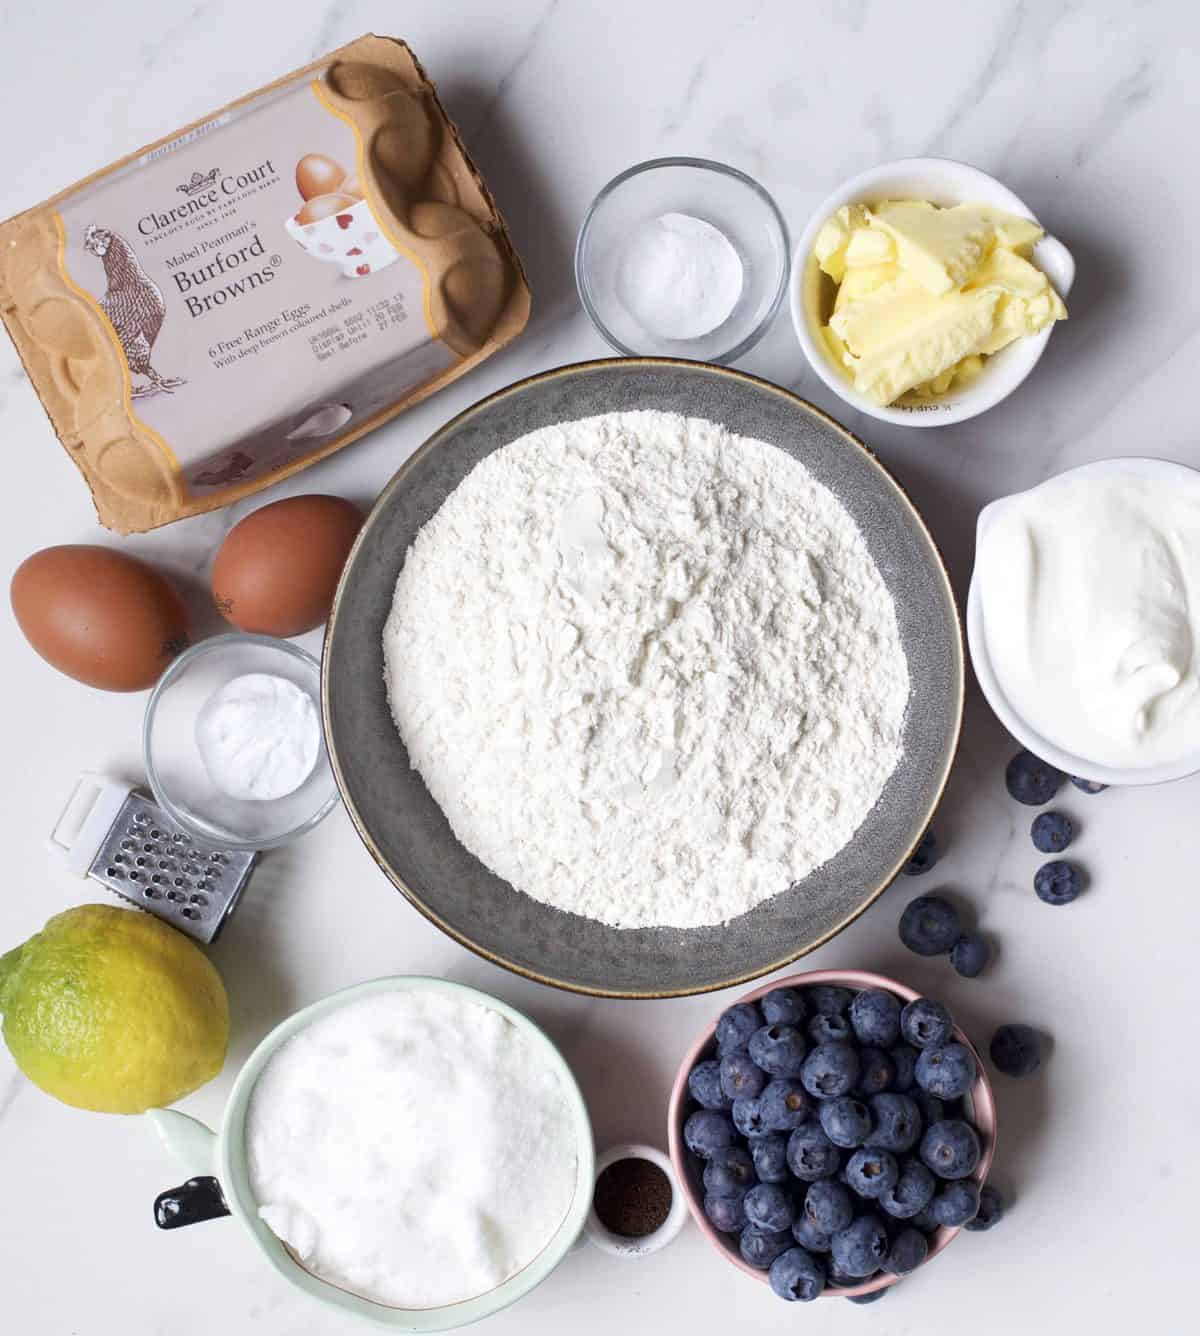 Ingredients for Blueberry Loaf